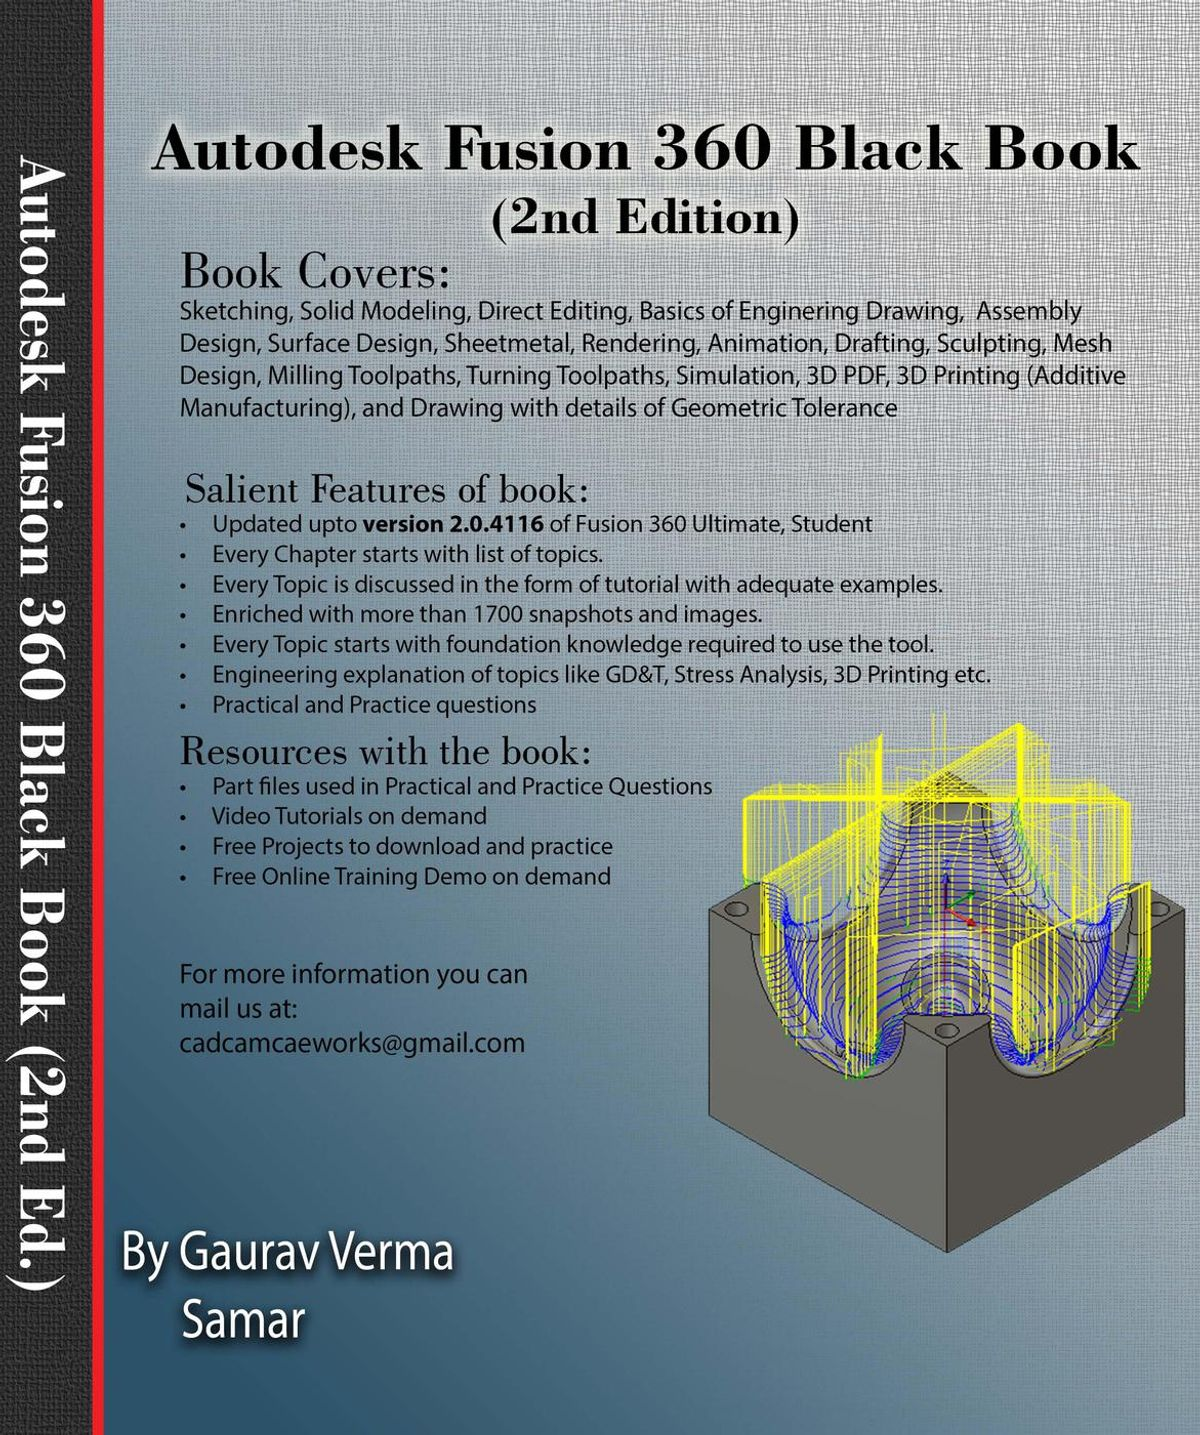 Autodesk Fusion 360 Black Book (2nd Edition) - Part 1 - eBook